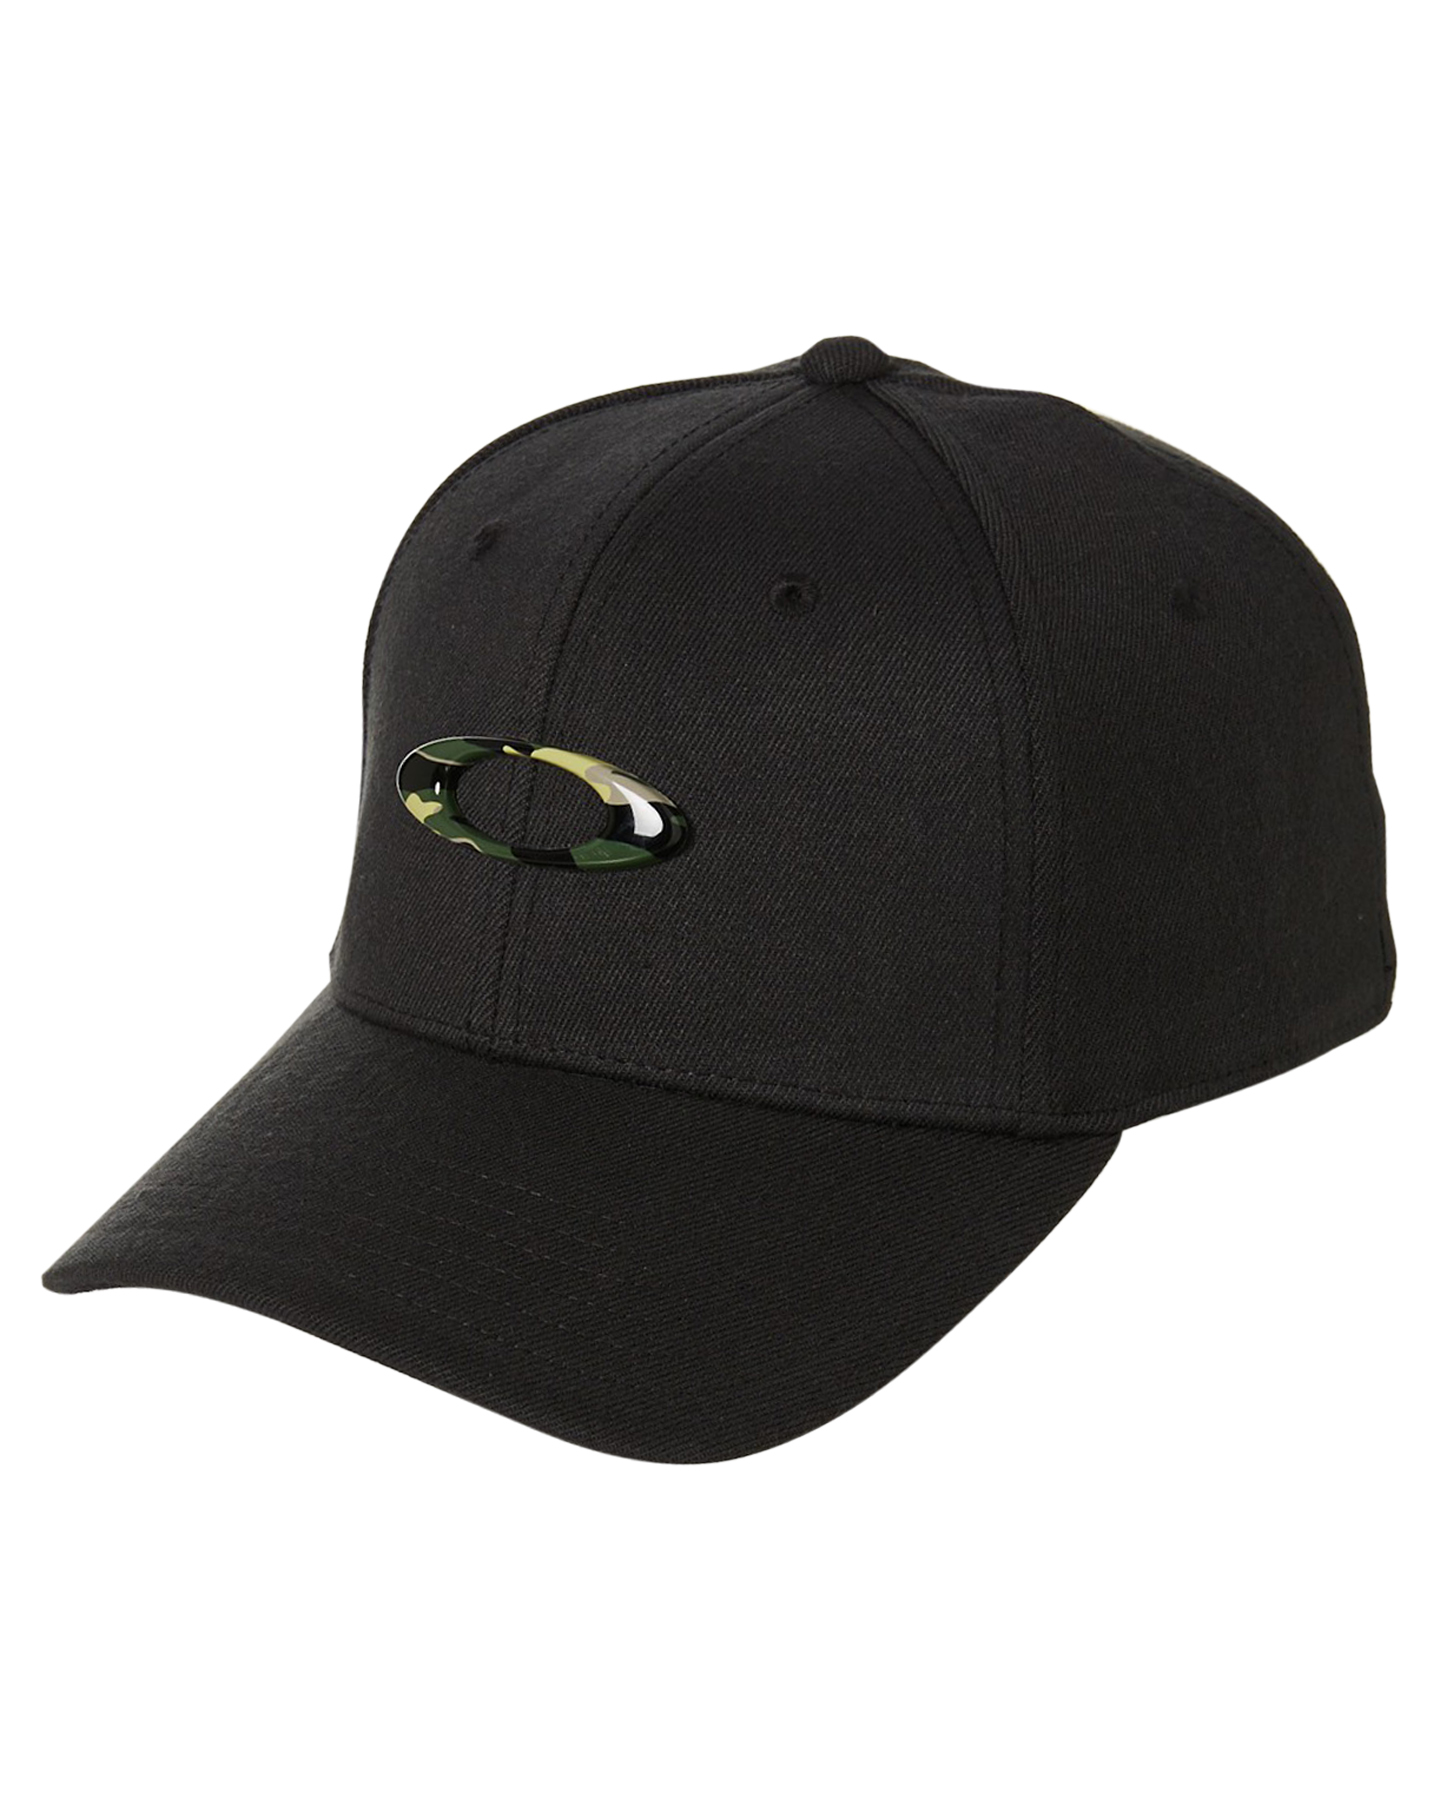 Oakley Tincan Cap Black Graphic Camo